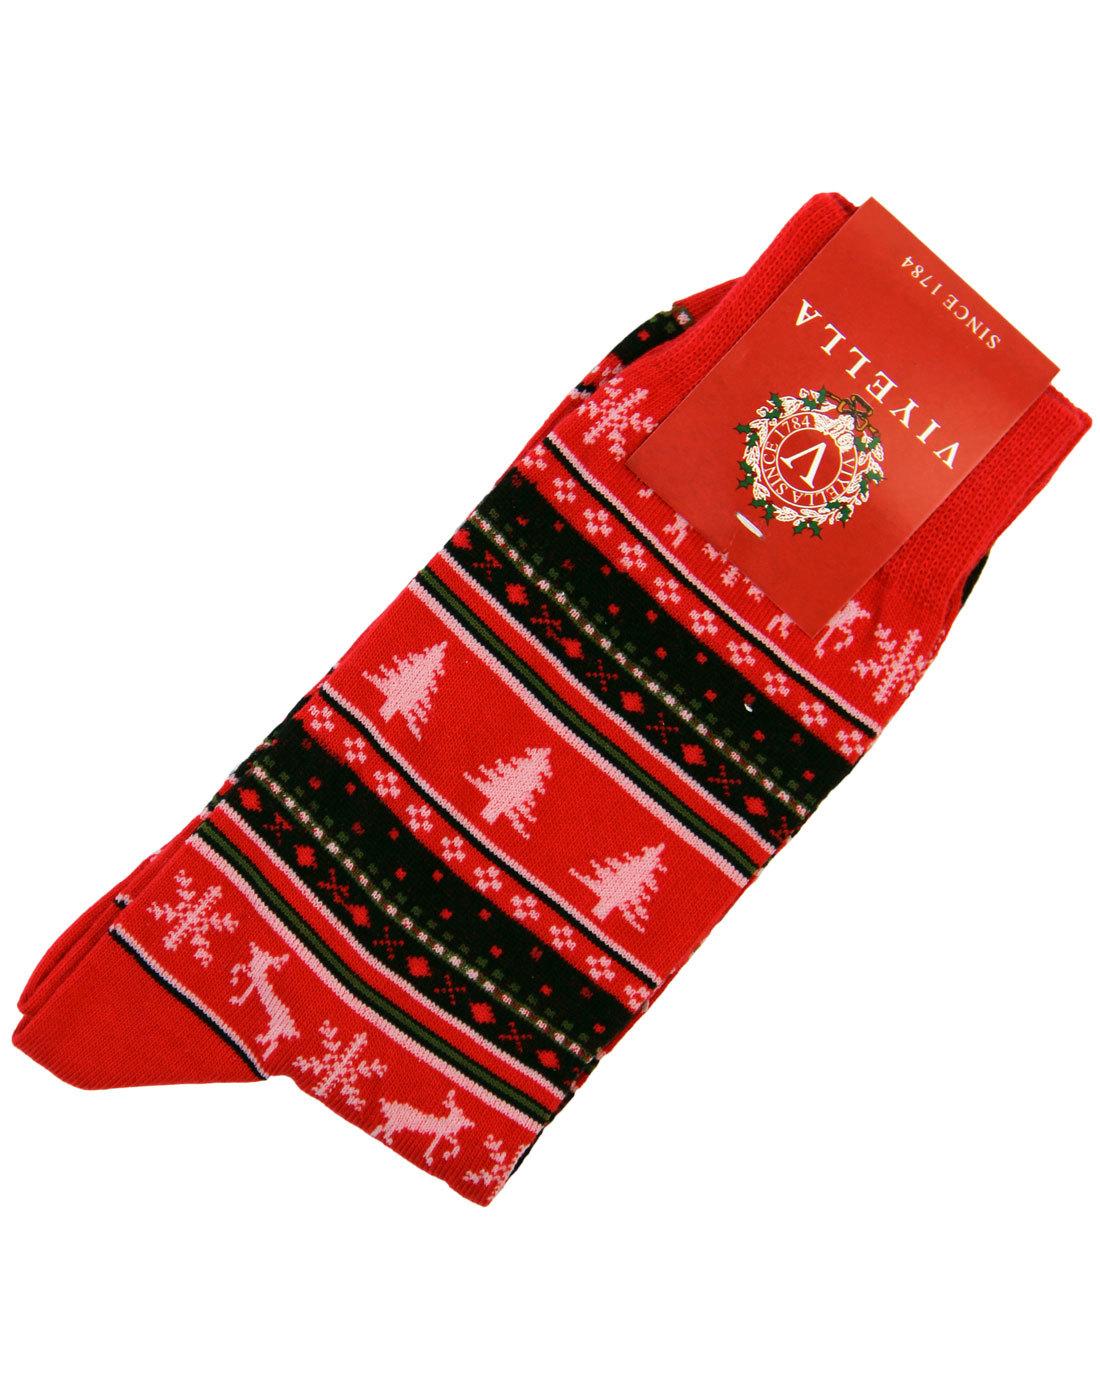 + Christmas Fairisle VIYELLA Retro Christmas Socks